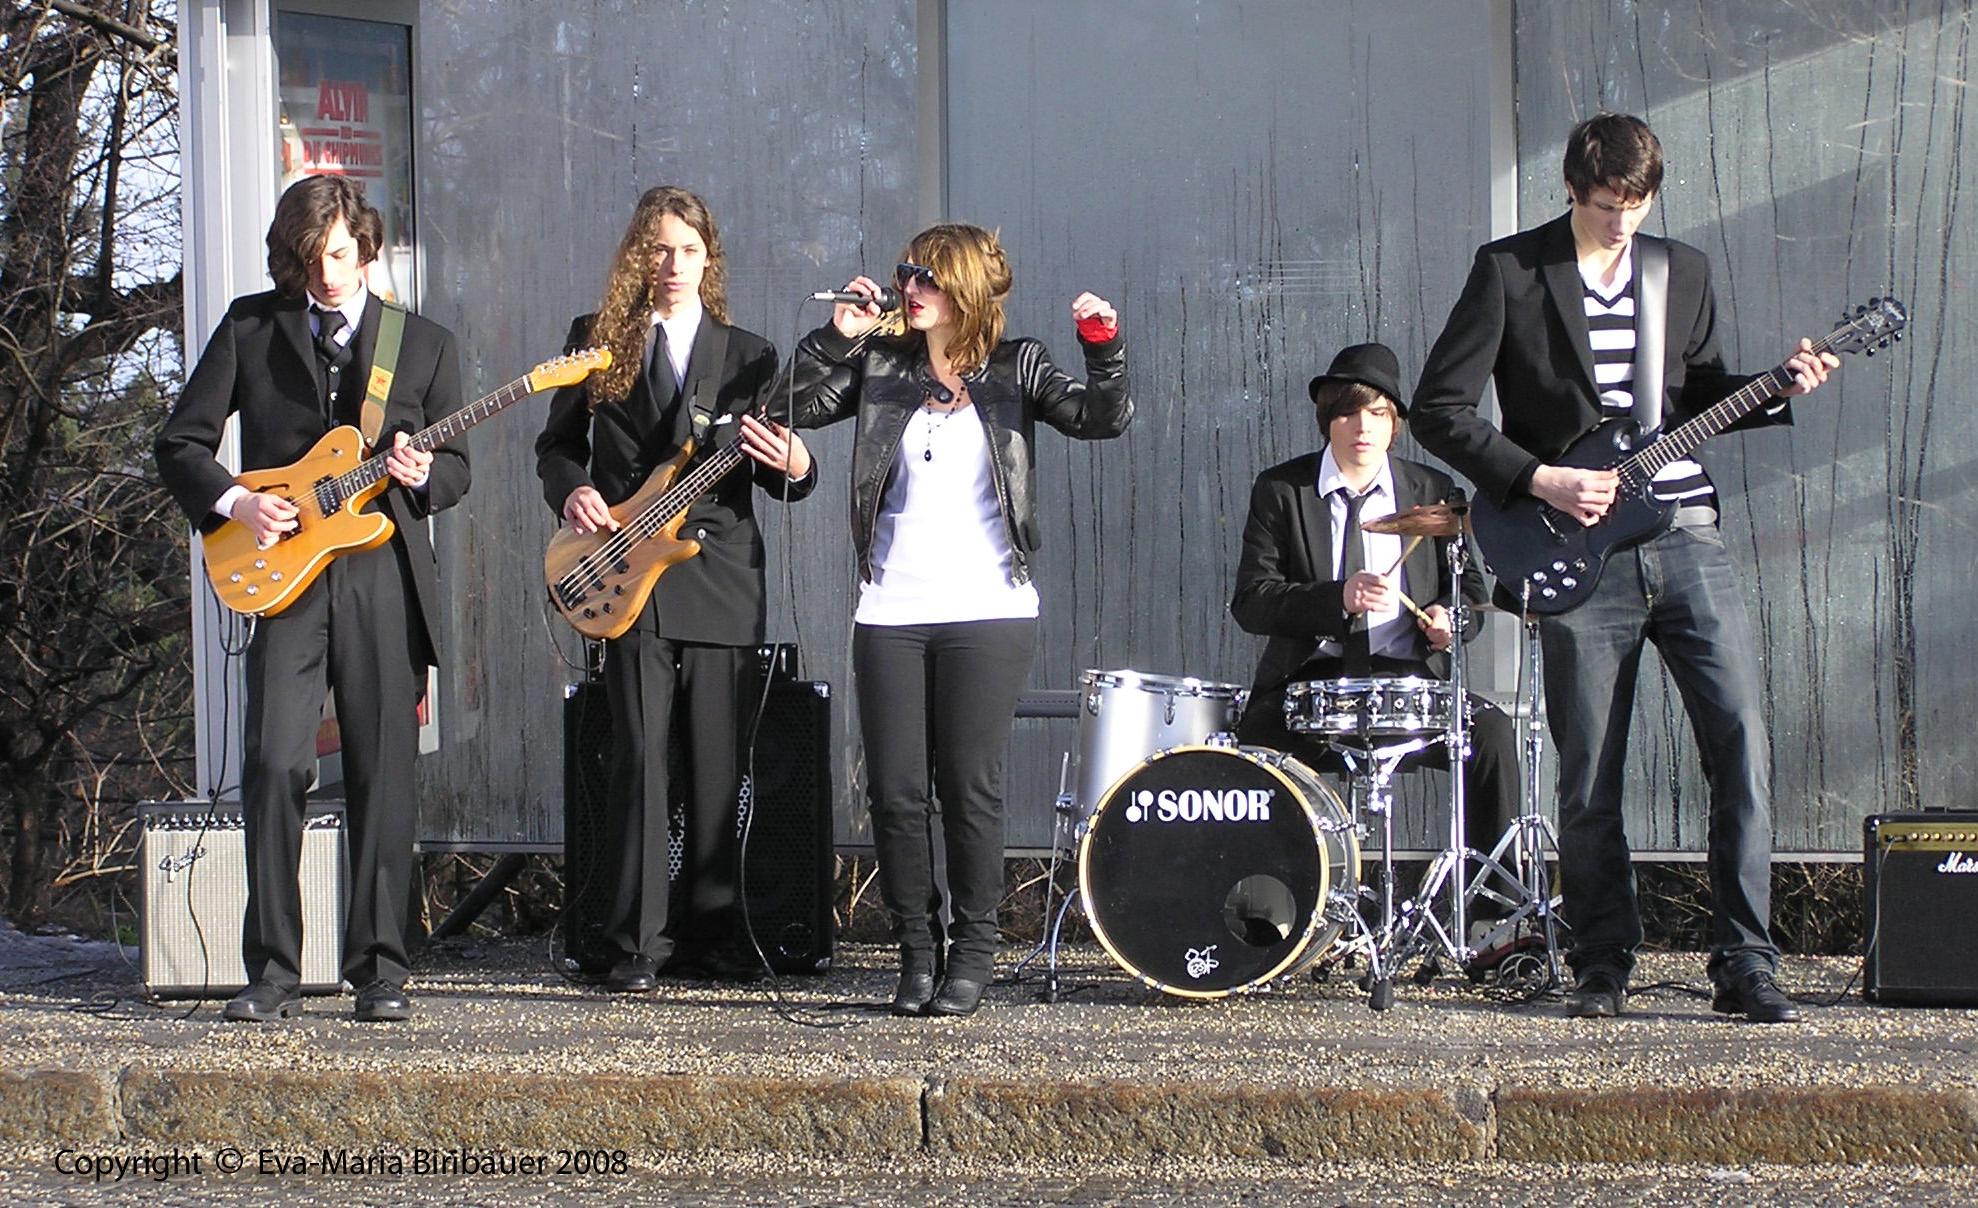 Musikvideo, Svensklik Perra, Styling 2008